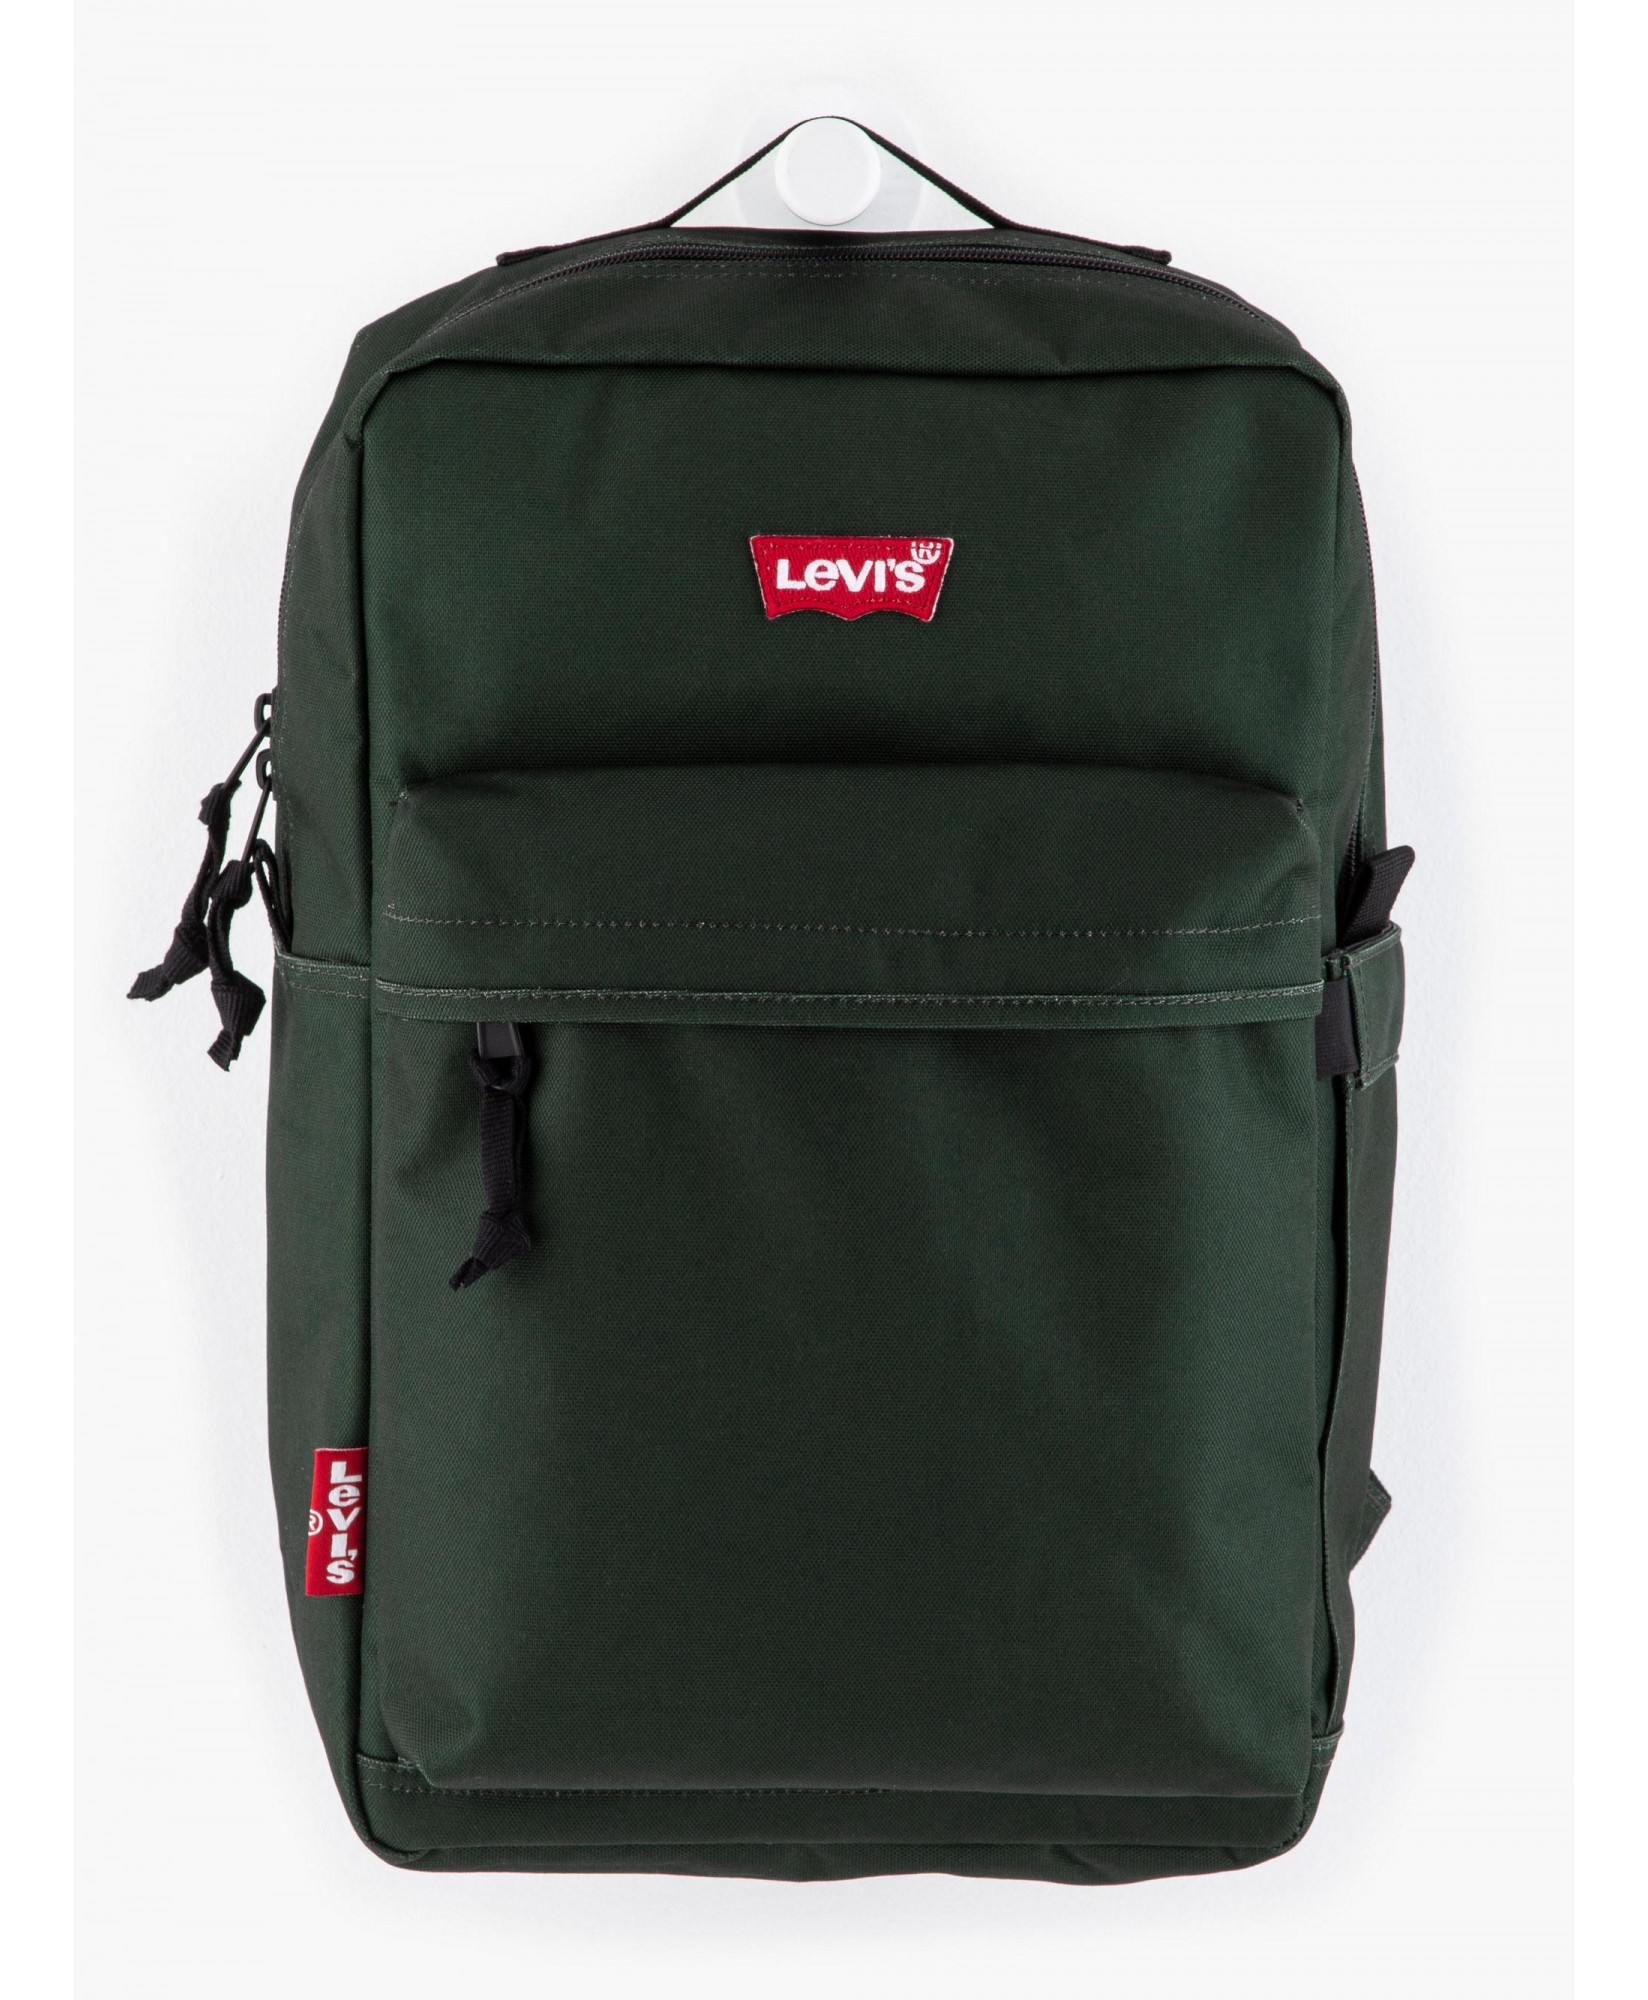 Updated Levis L Pack Sta Updated Levis L Pack Sta